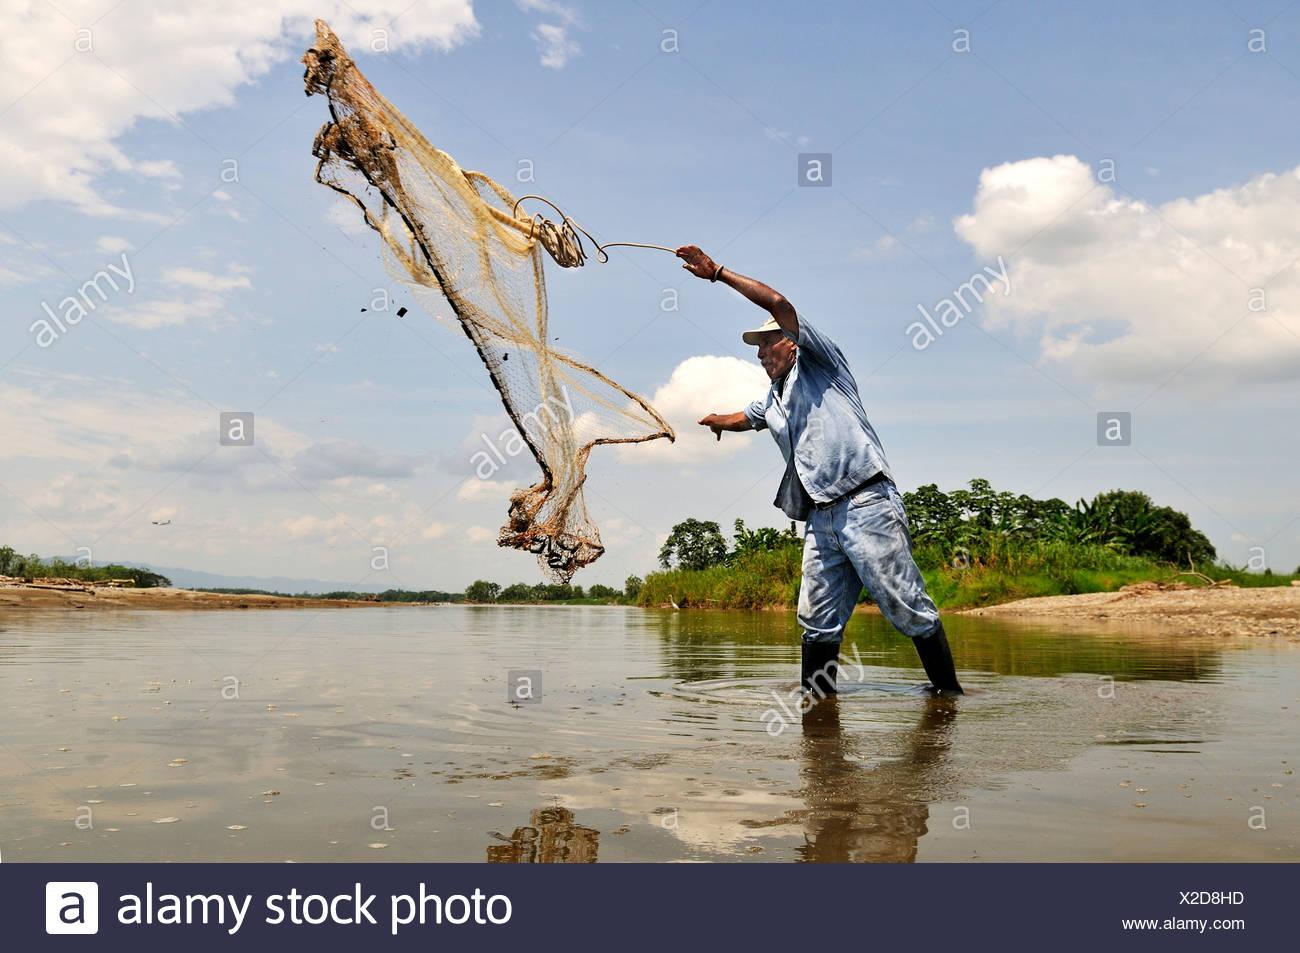 Fisherman tossing a net into the Rio Magdalena River, La Dorada, Caldas, Colombia, South America - Stock Image